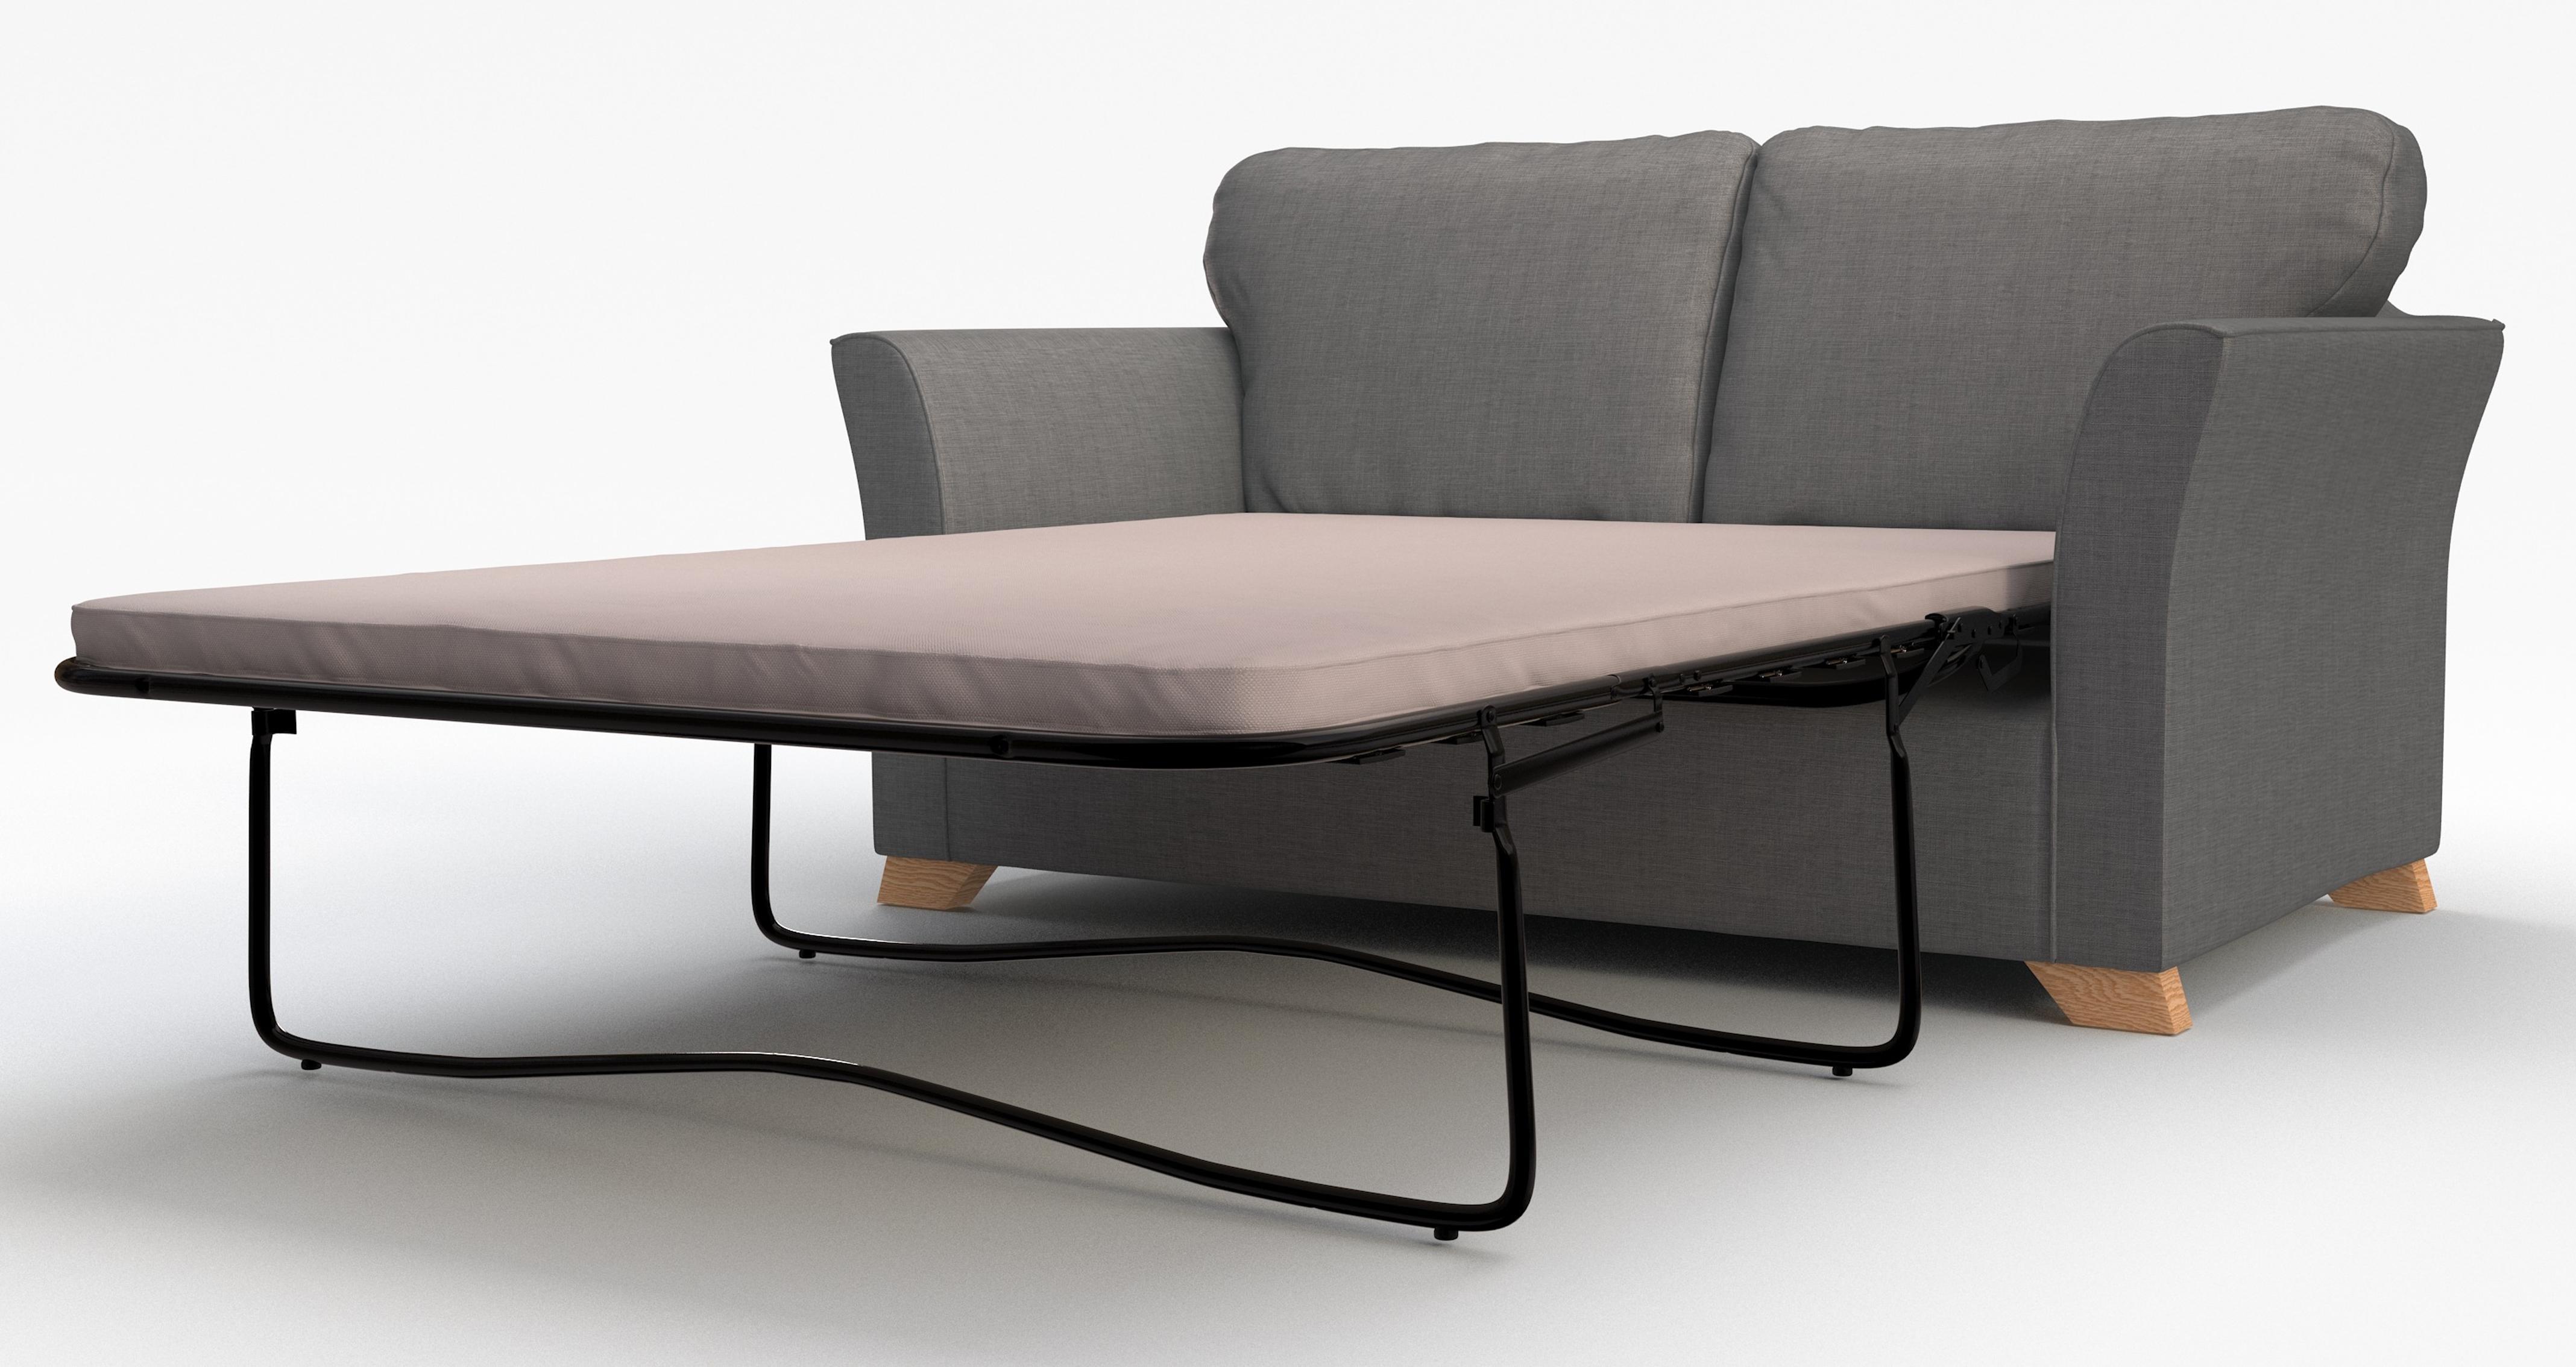 Zinc 4 seater sofa dfs sofa the honoroak Dfs 4 seater leather sofa